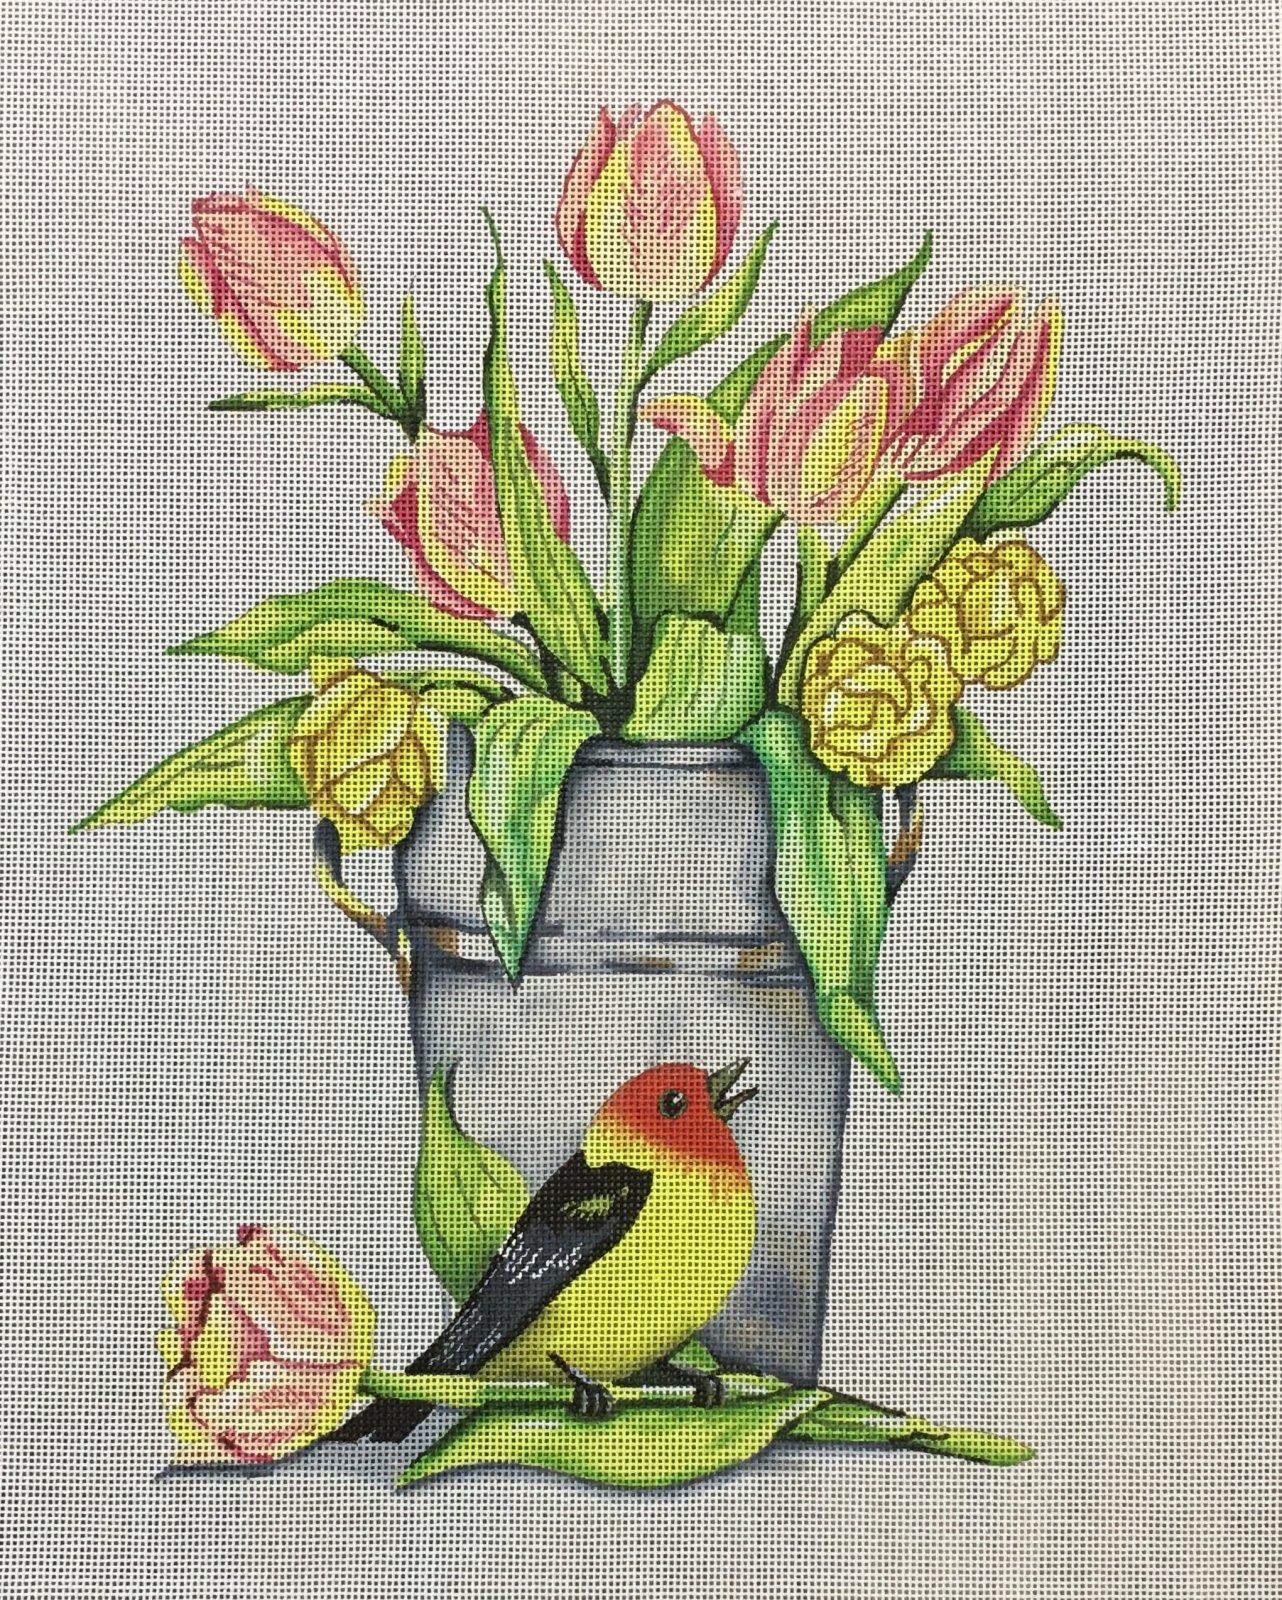 Tulips with Bird